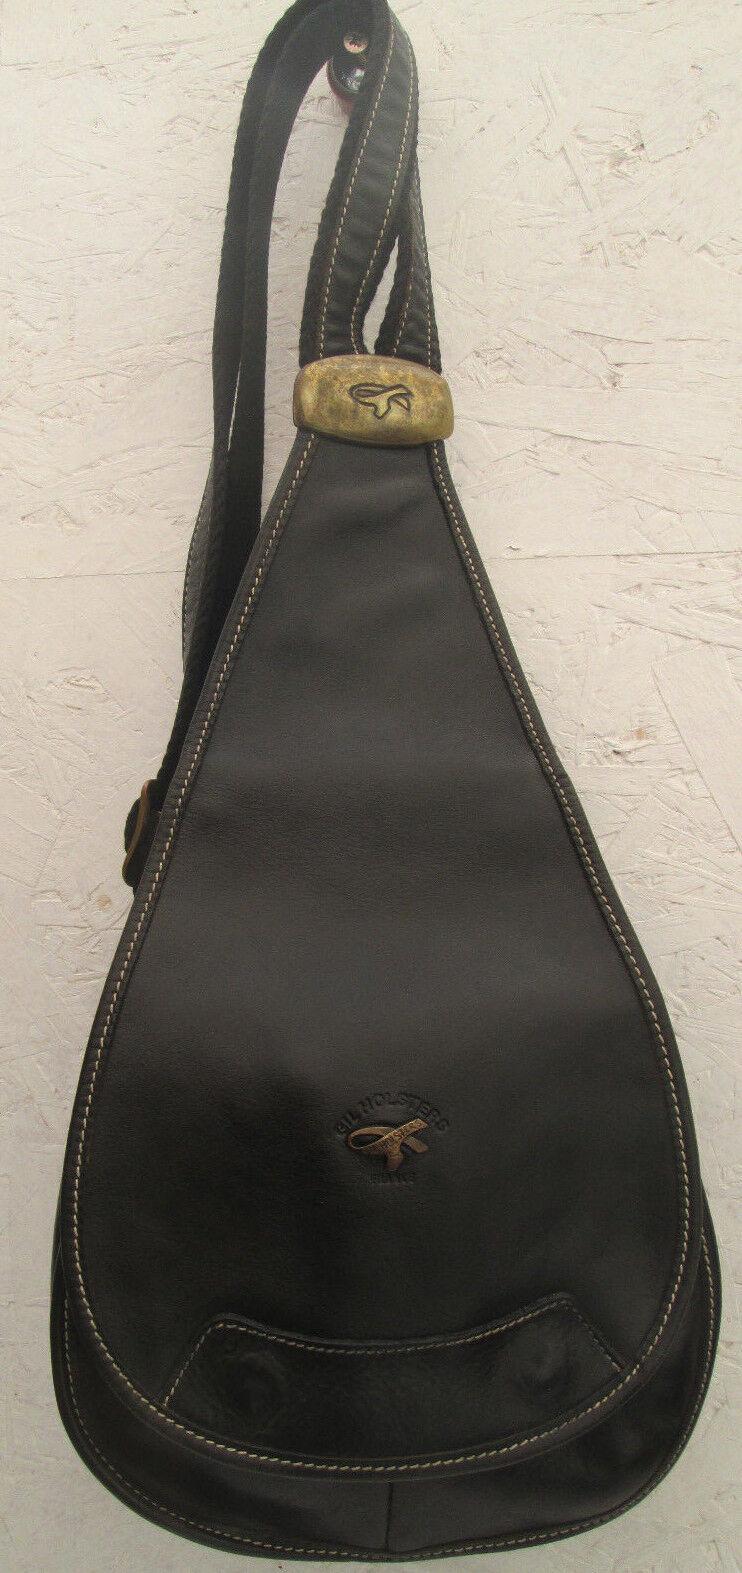 -AUTHENTIQUE sac à dos GIL HOLSTERS  cuir TBEG vintage